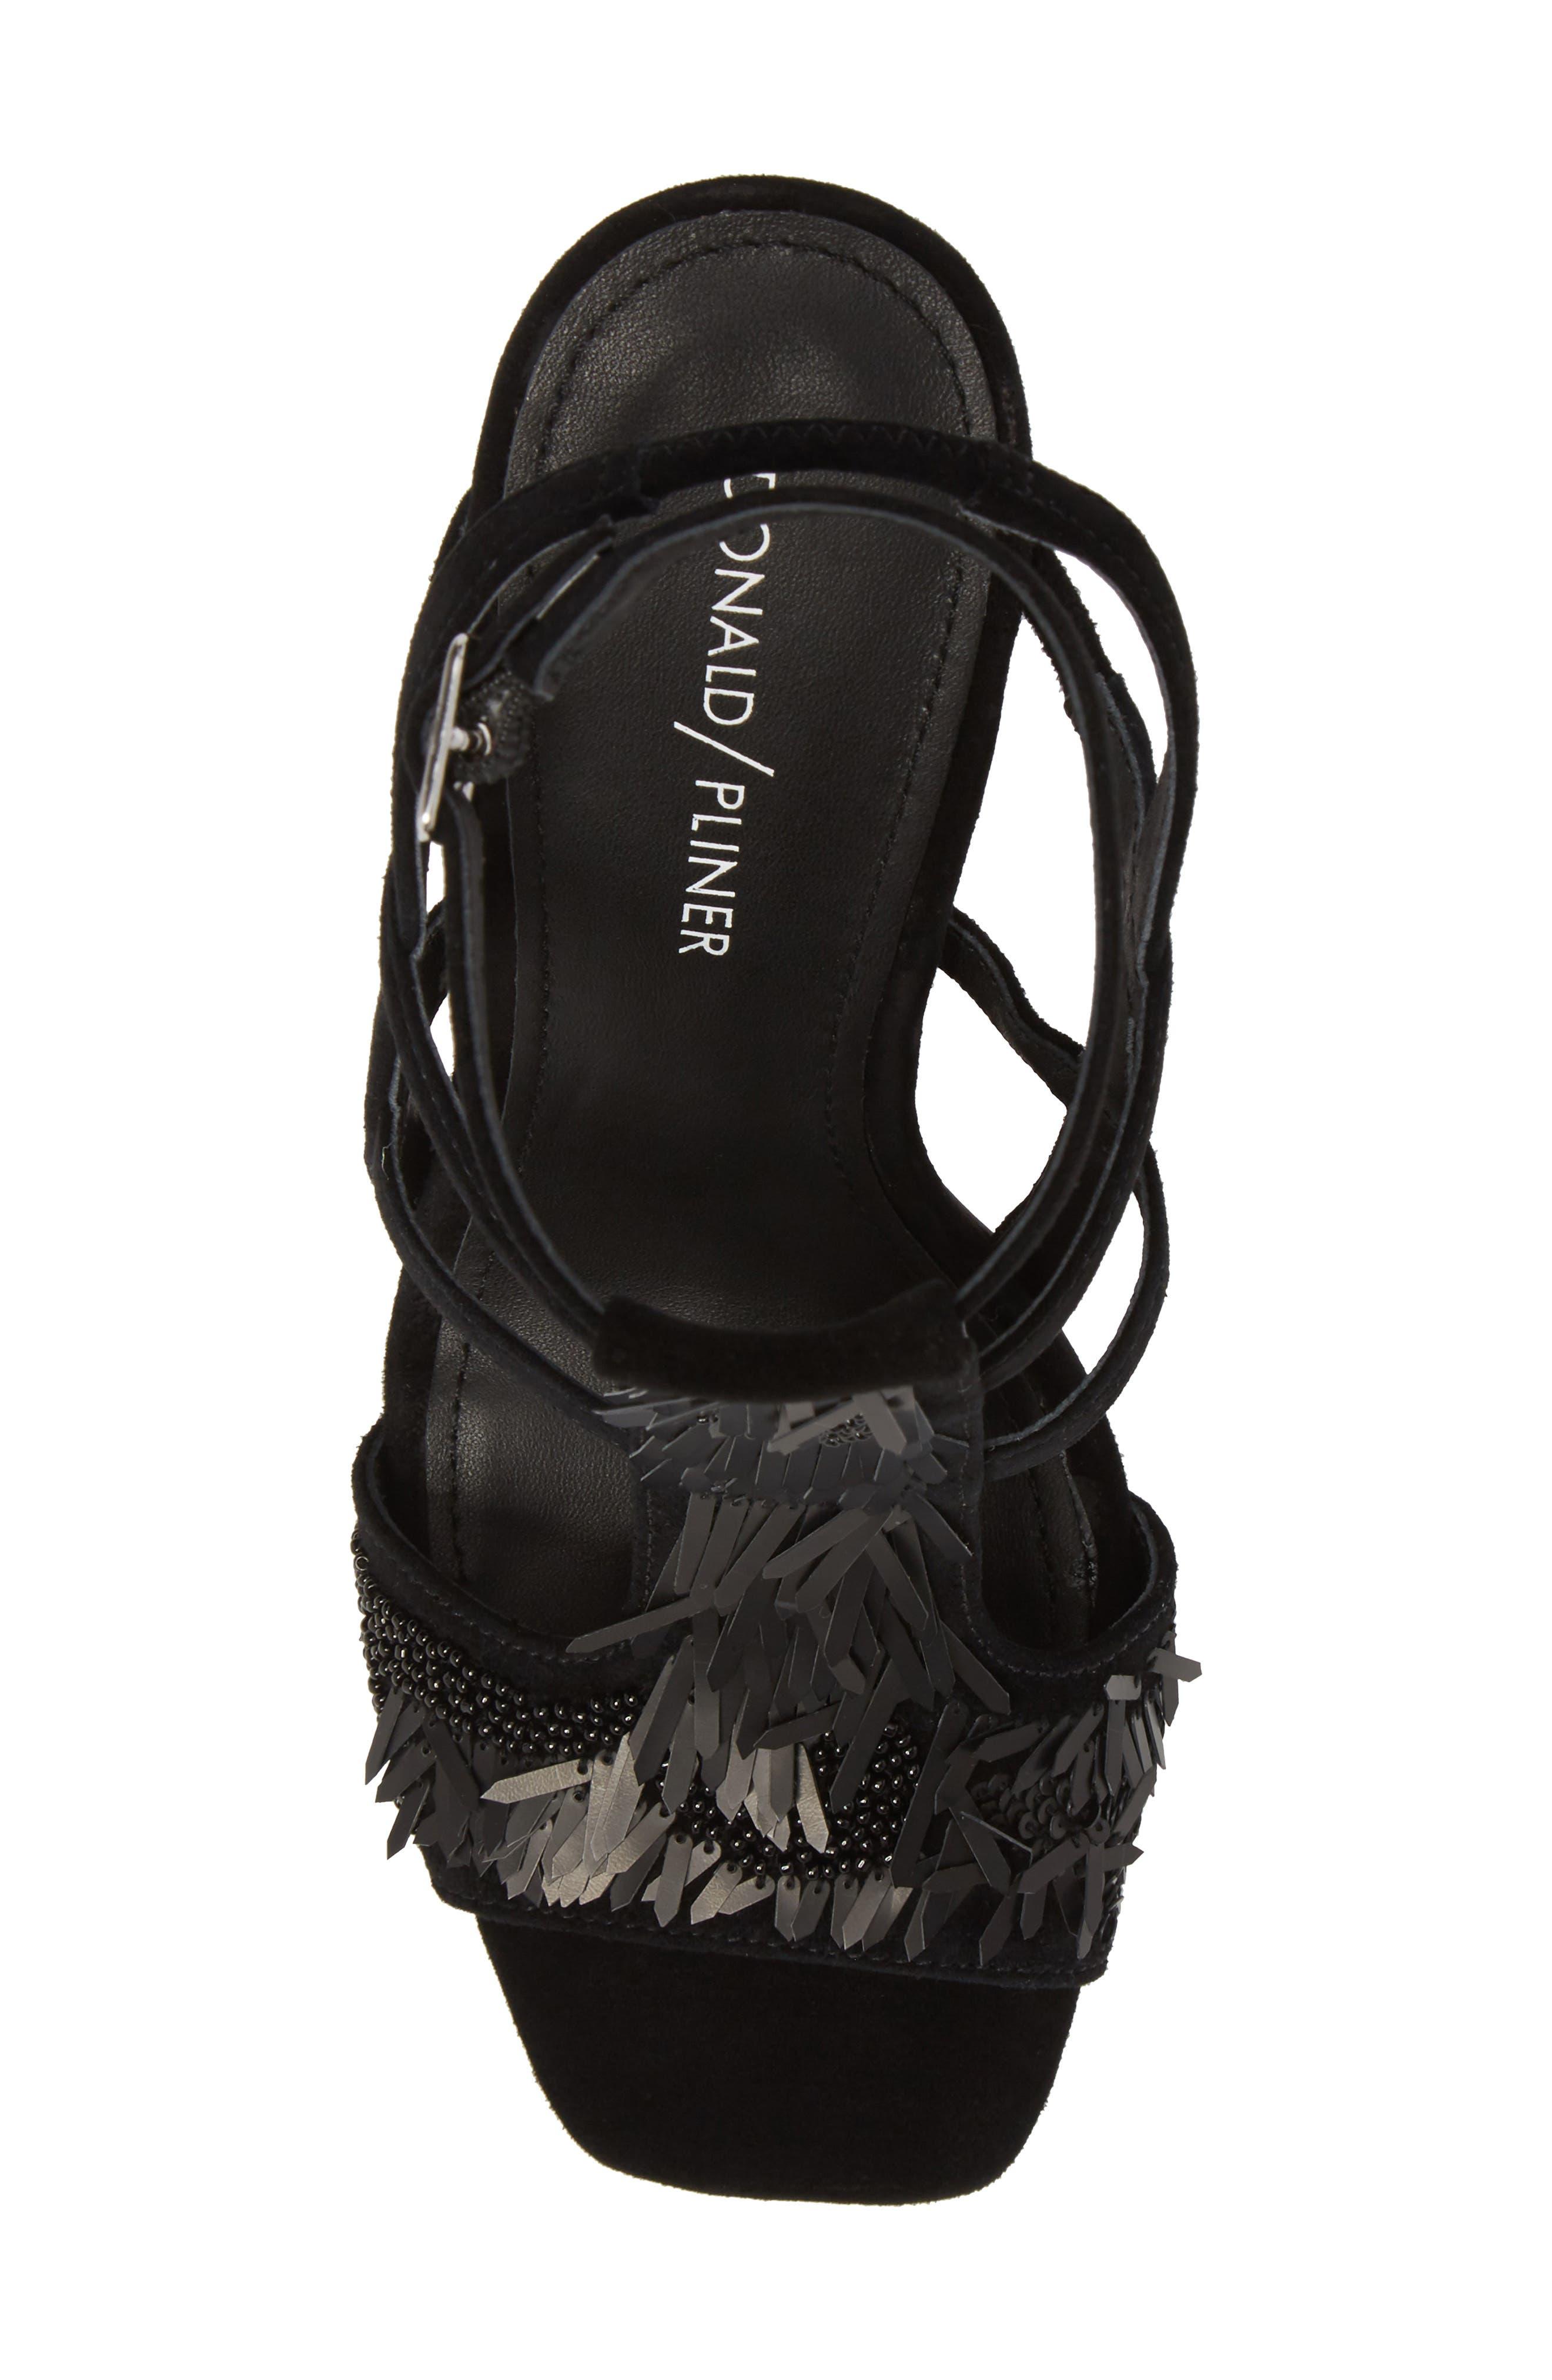 Willow Sandal,                             Alternate thumbnail 5, color,                             Black Sequin Fabric